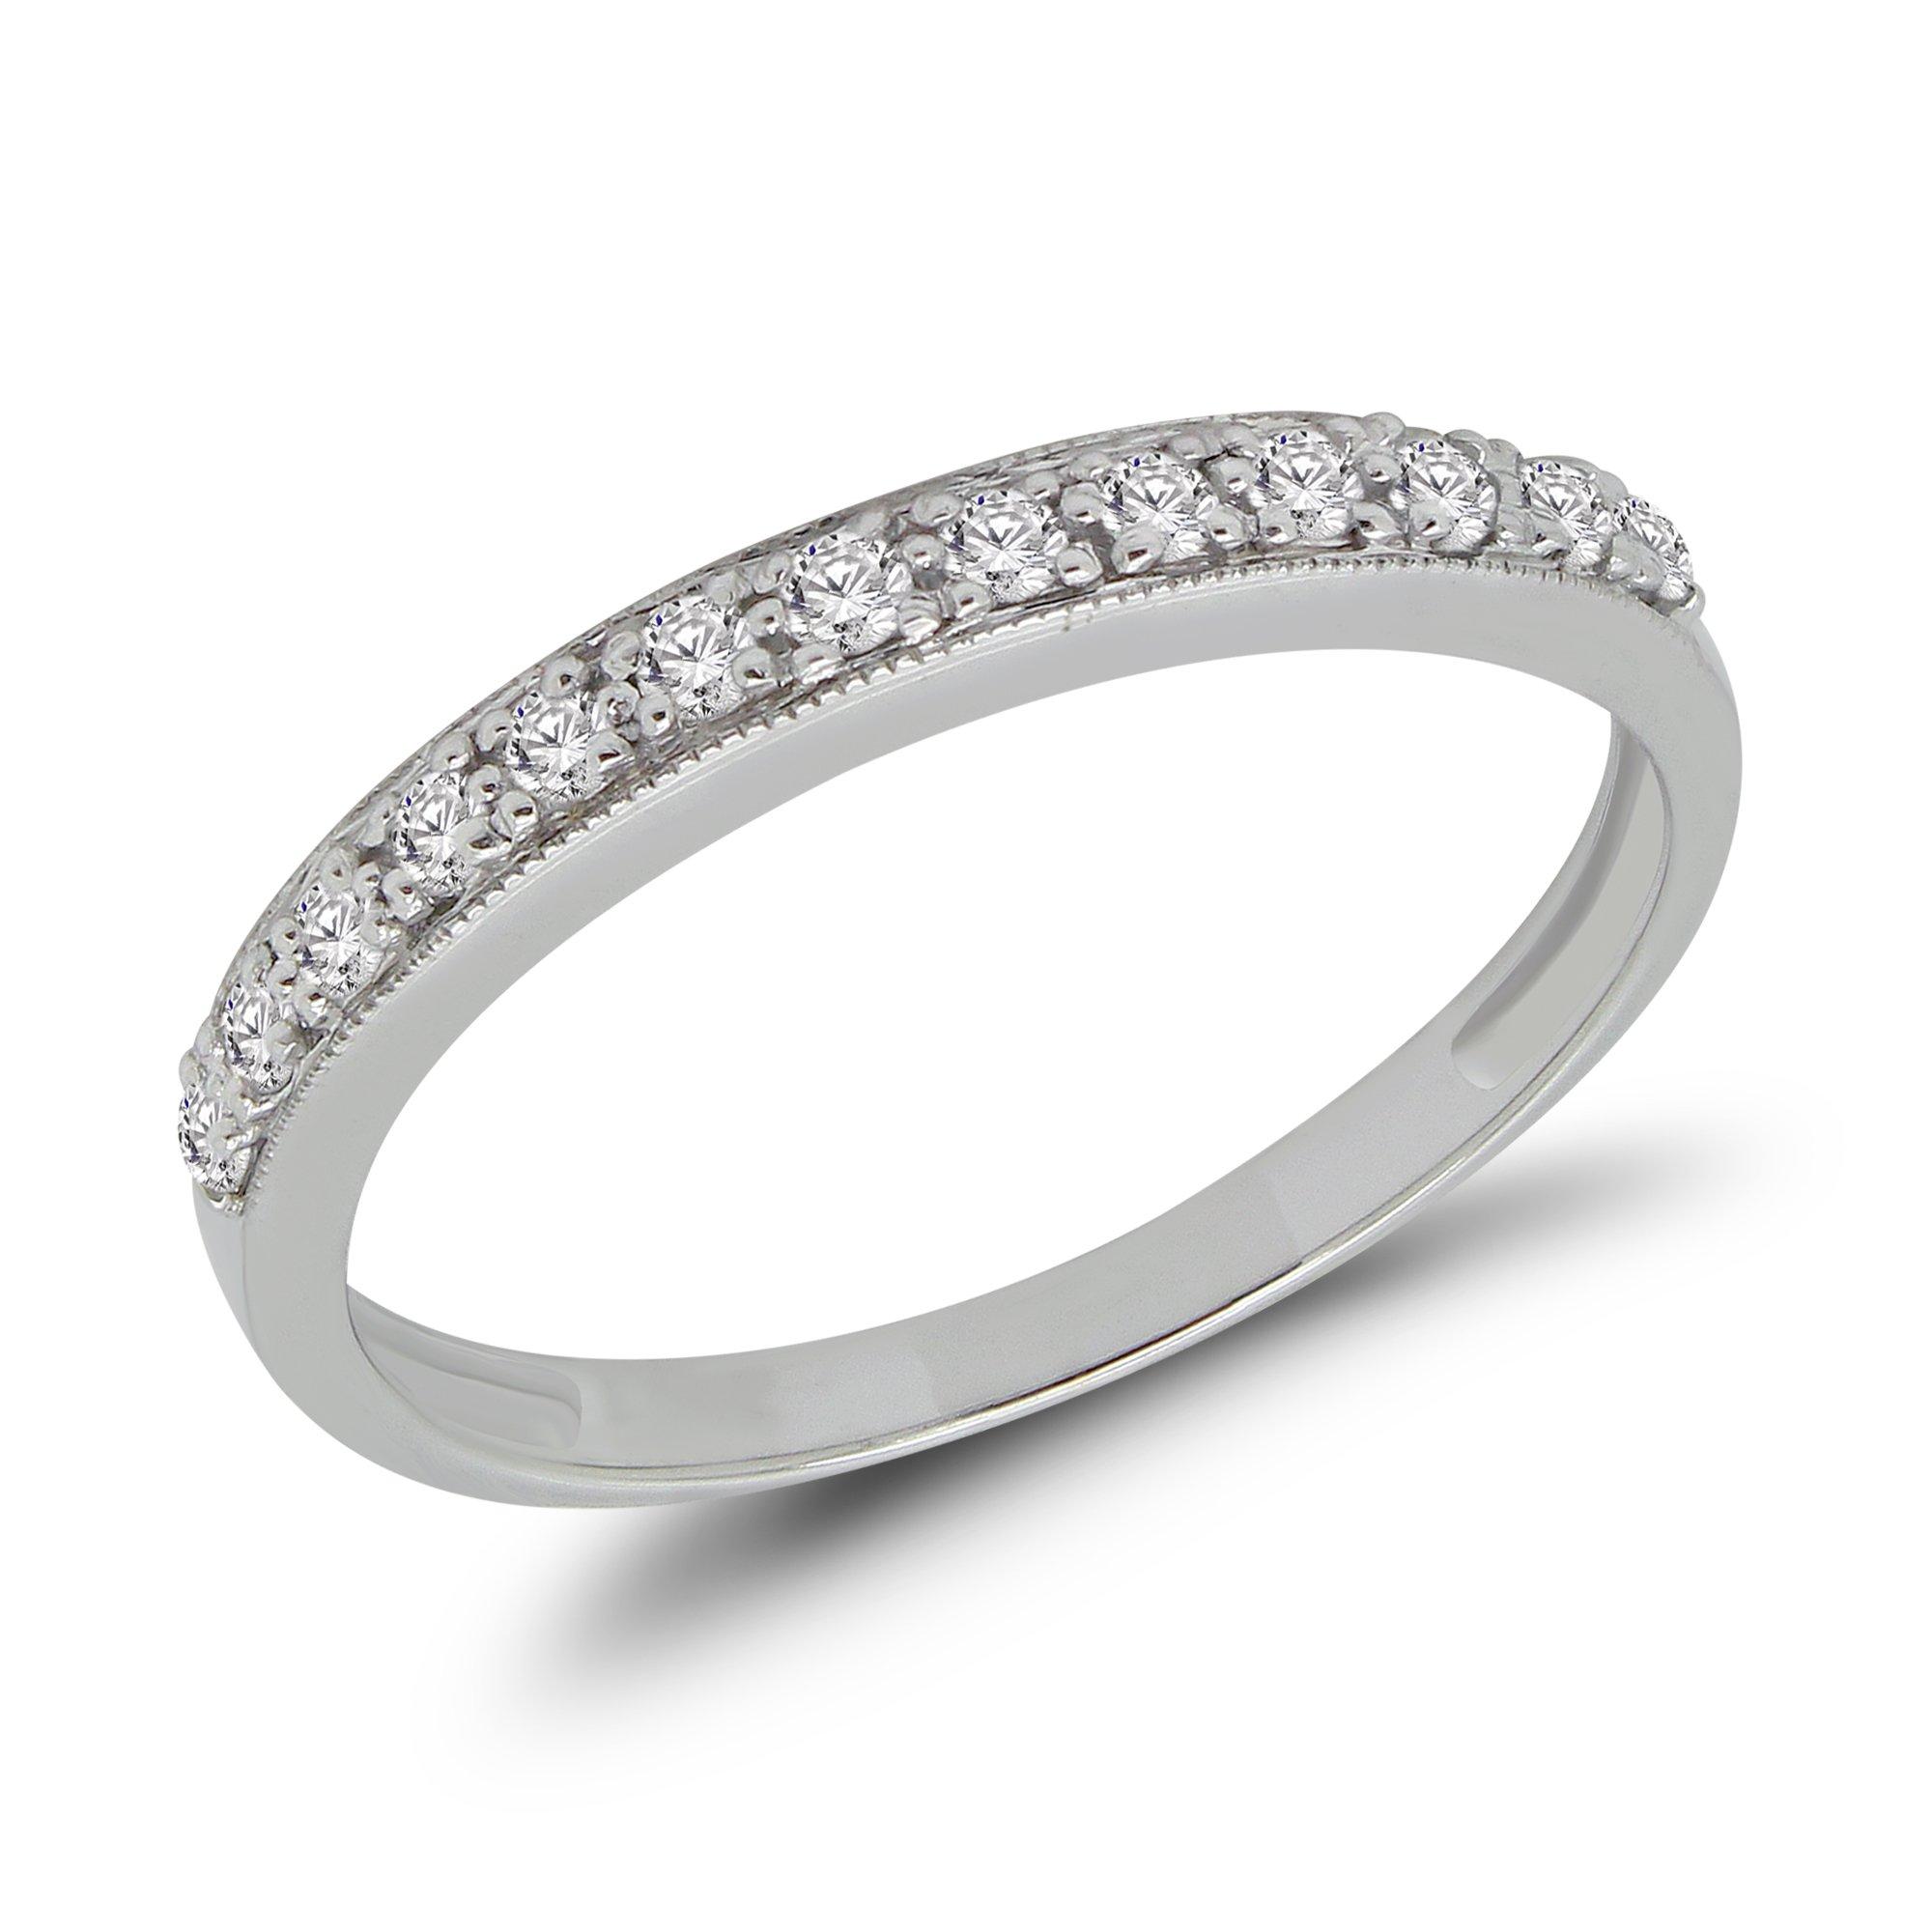 14K White Gold Round 0.20 Ct Diamond Wedding Bands For Women (Size - 7)